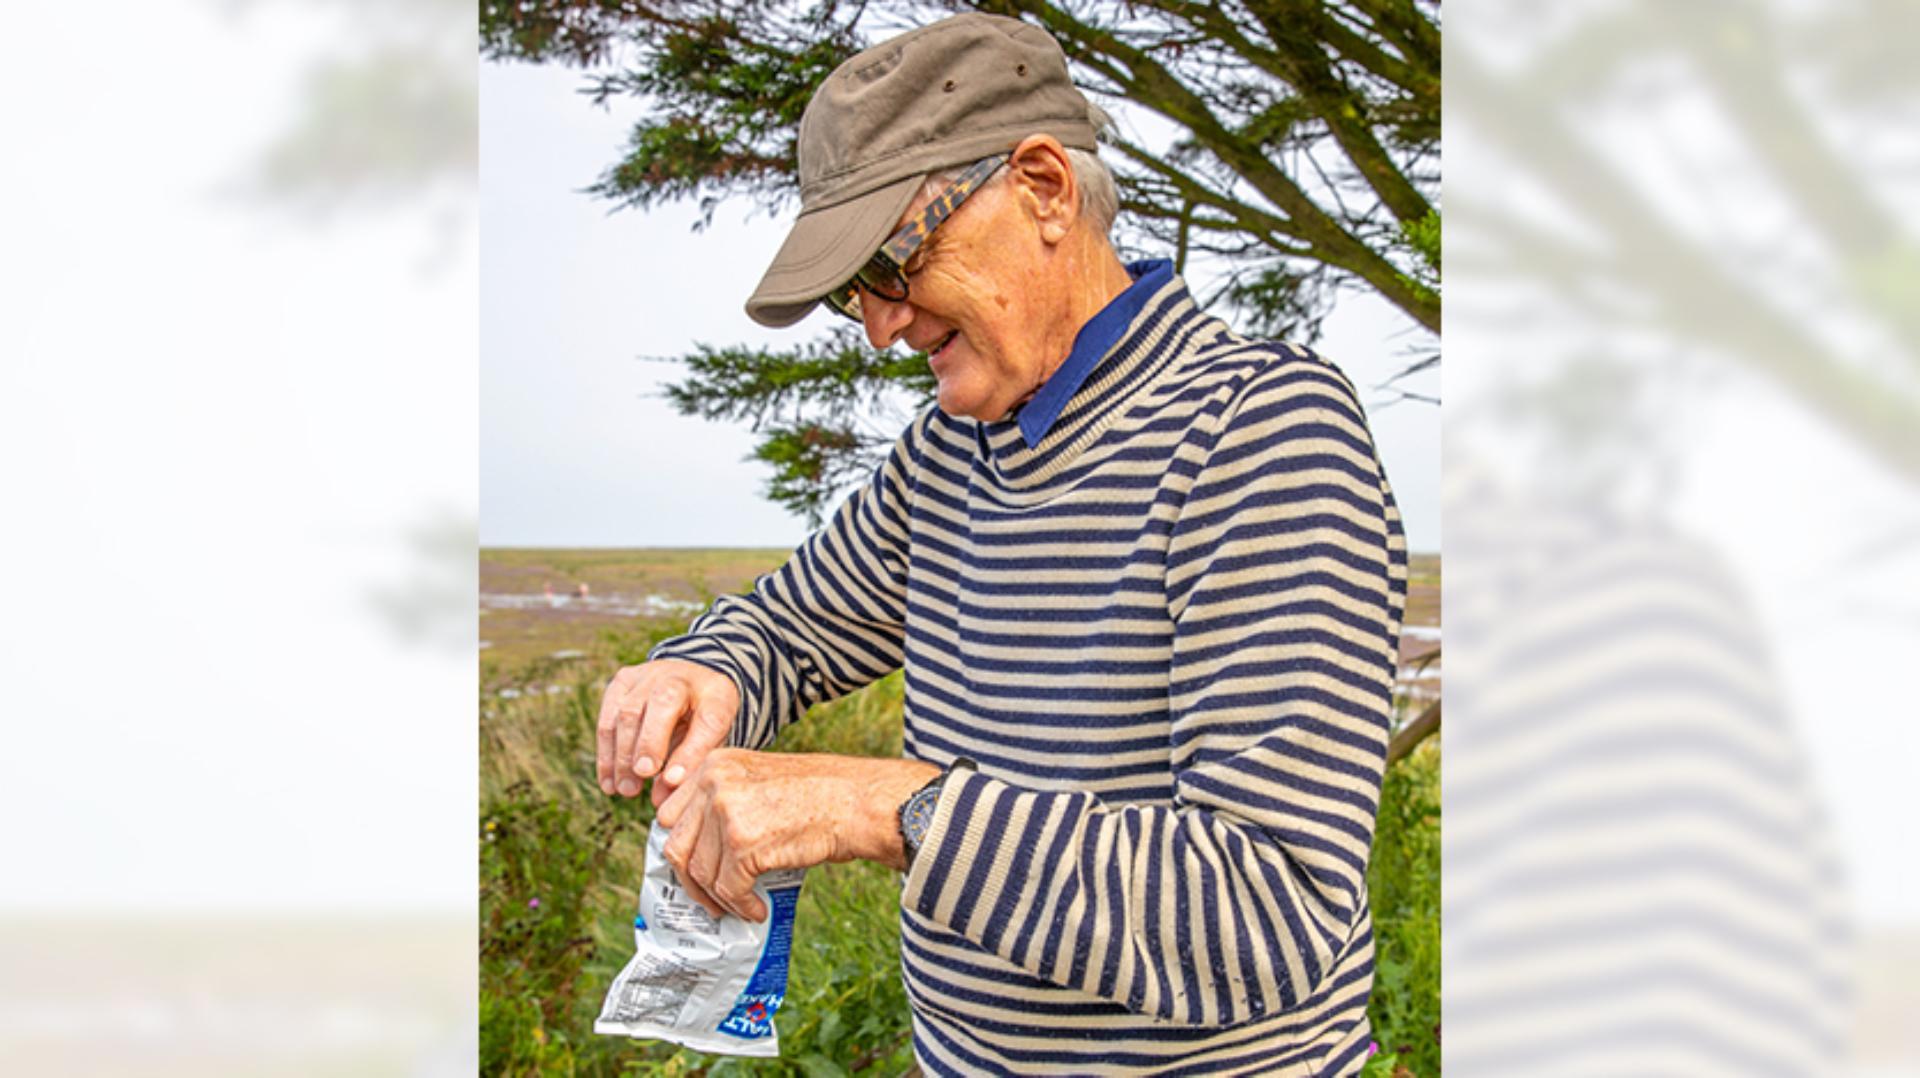 James Dyson holding a bag of Smiths potato crisps